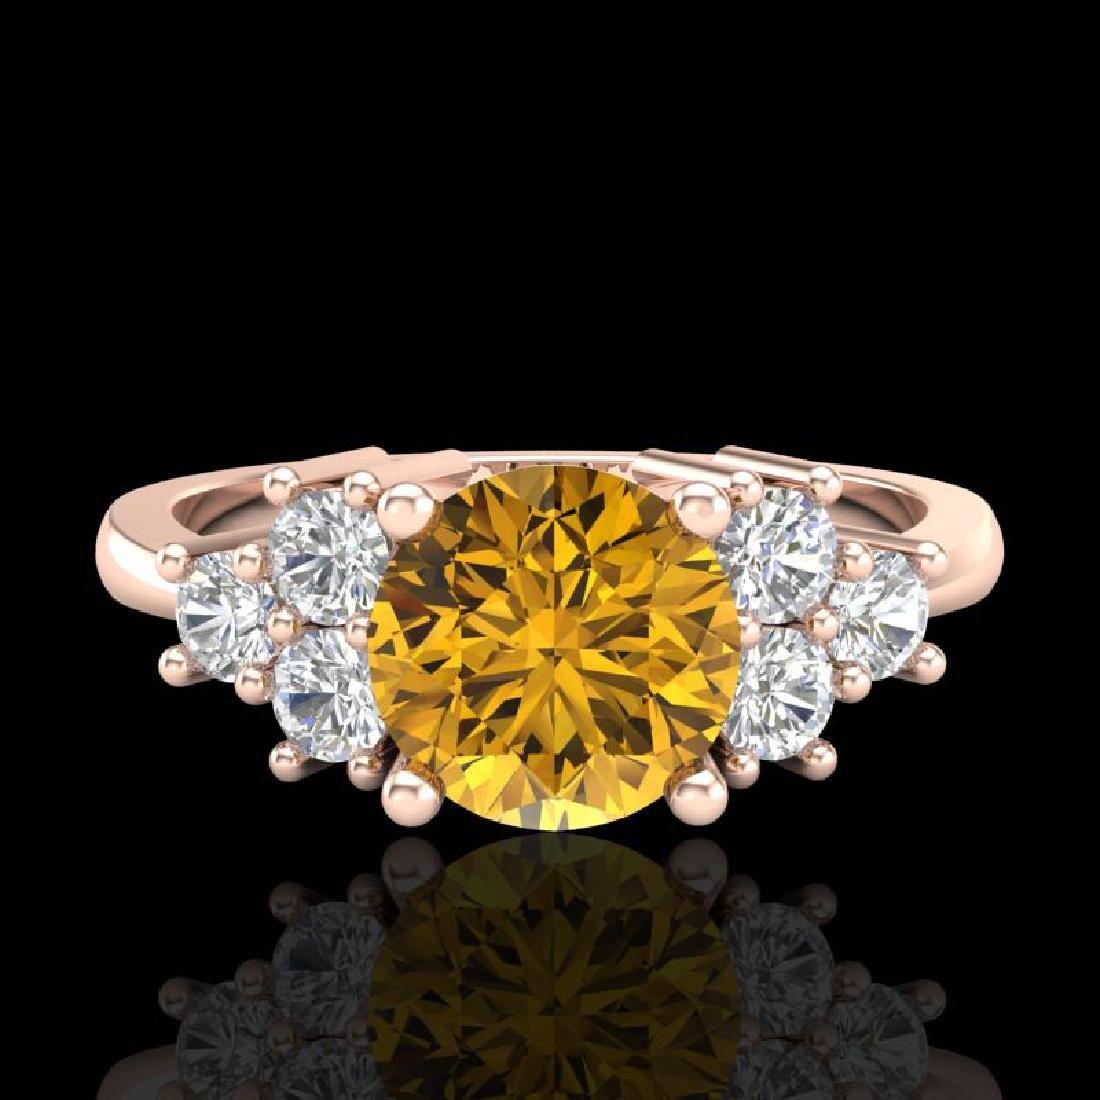 1.5 CTW Intense Fancy Yellow Diamond Solitaire Classic - 2